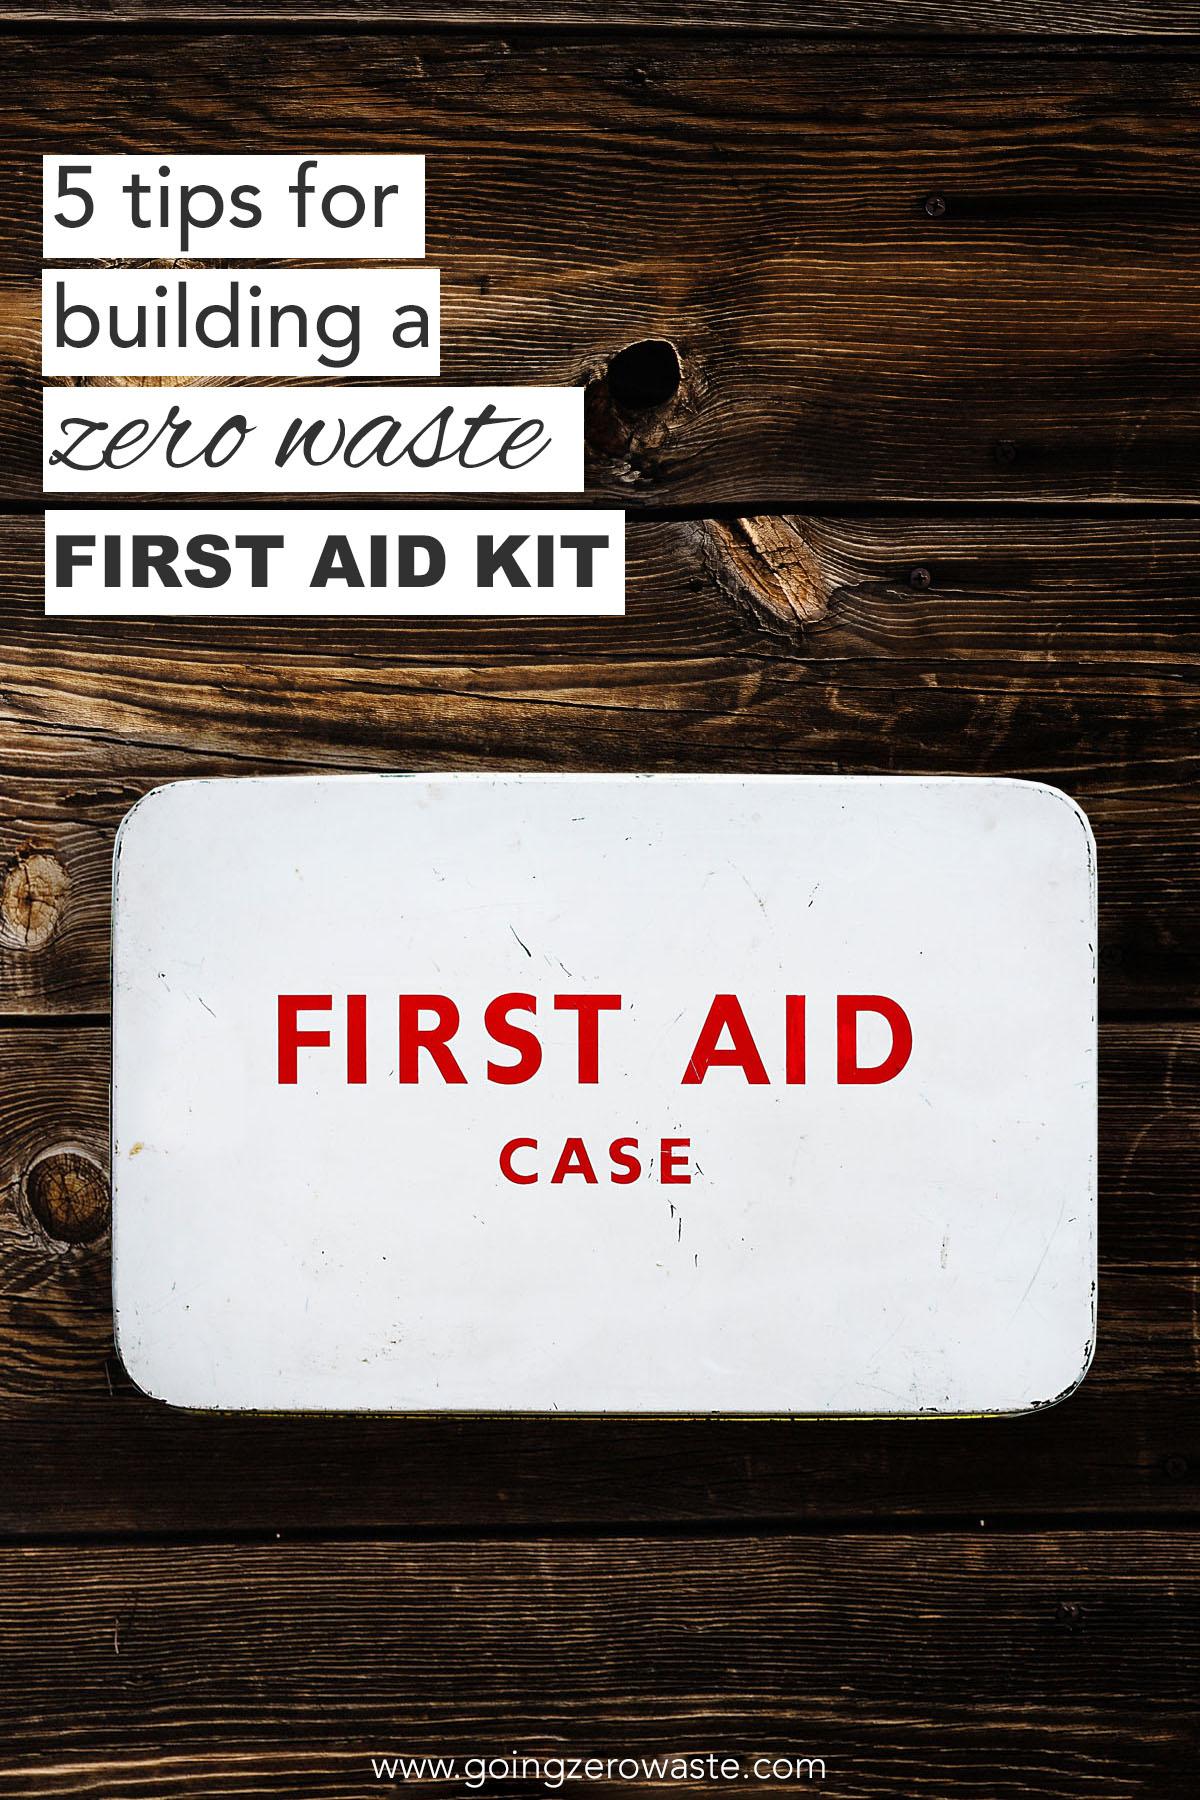 5 tips for creating a zero waste first aid kit from www.goingzerowaste.com #ecofriendly #zerowaste #firstaid